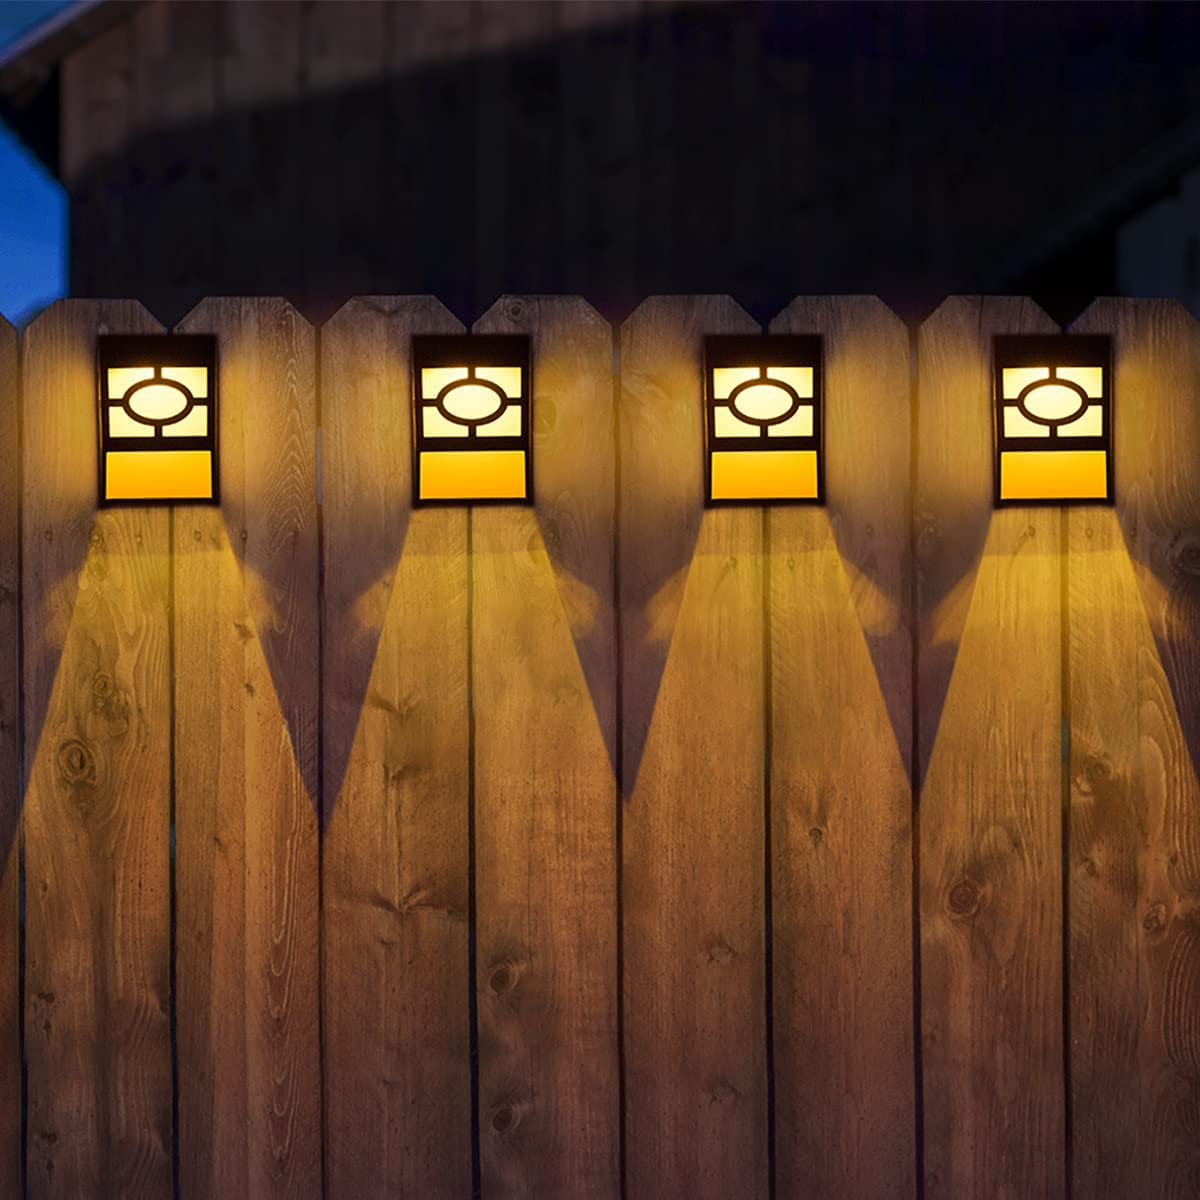 Solar Deck Lights, 6 Packs Outdoor Wall Lights Garden Decorative Fence Post Lighting - -